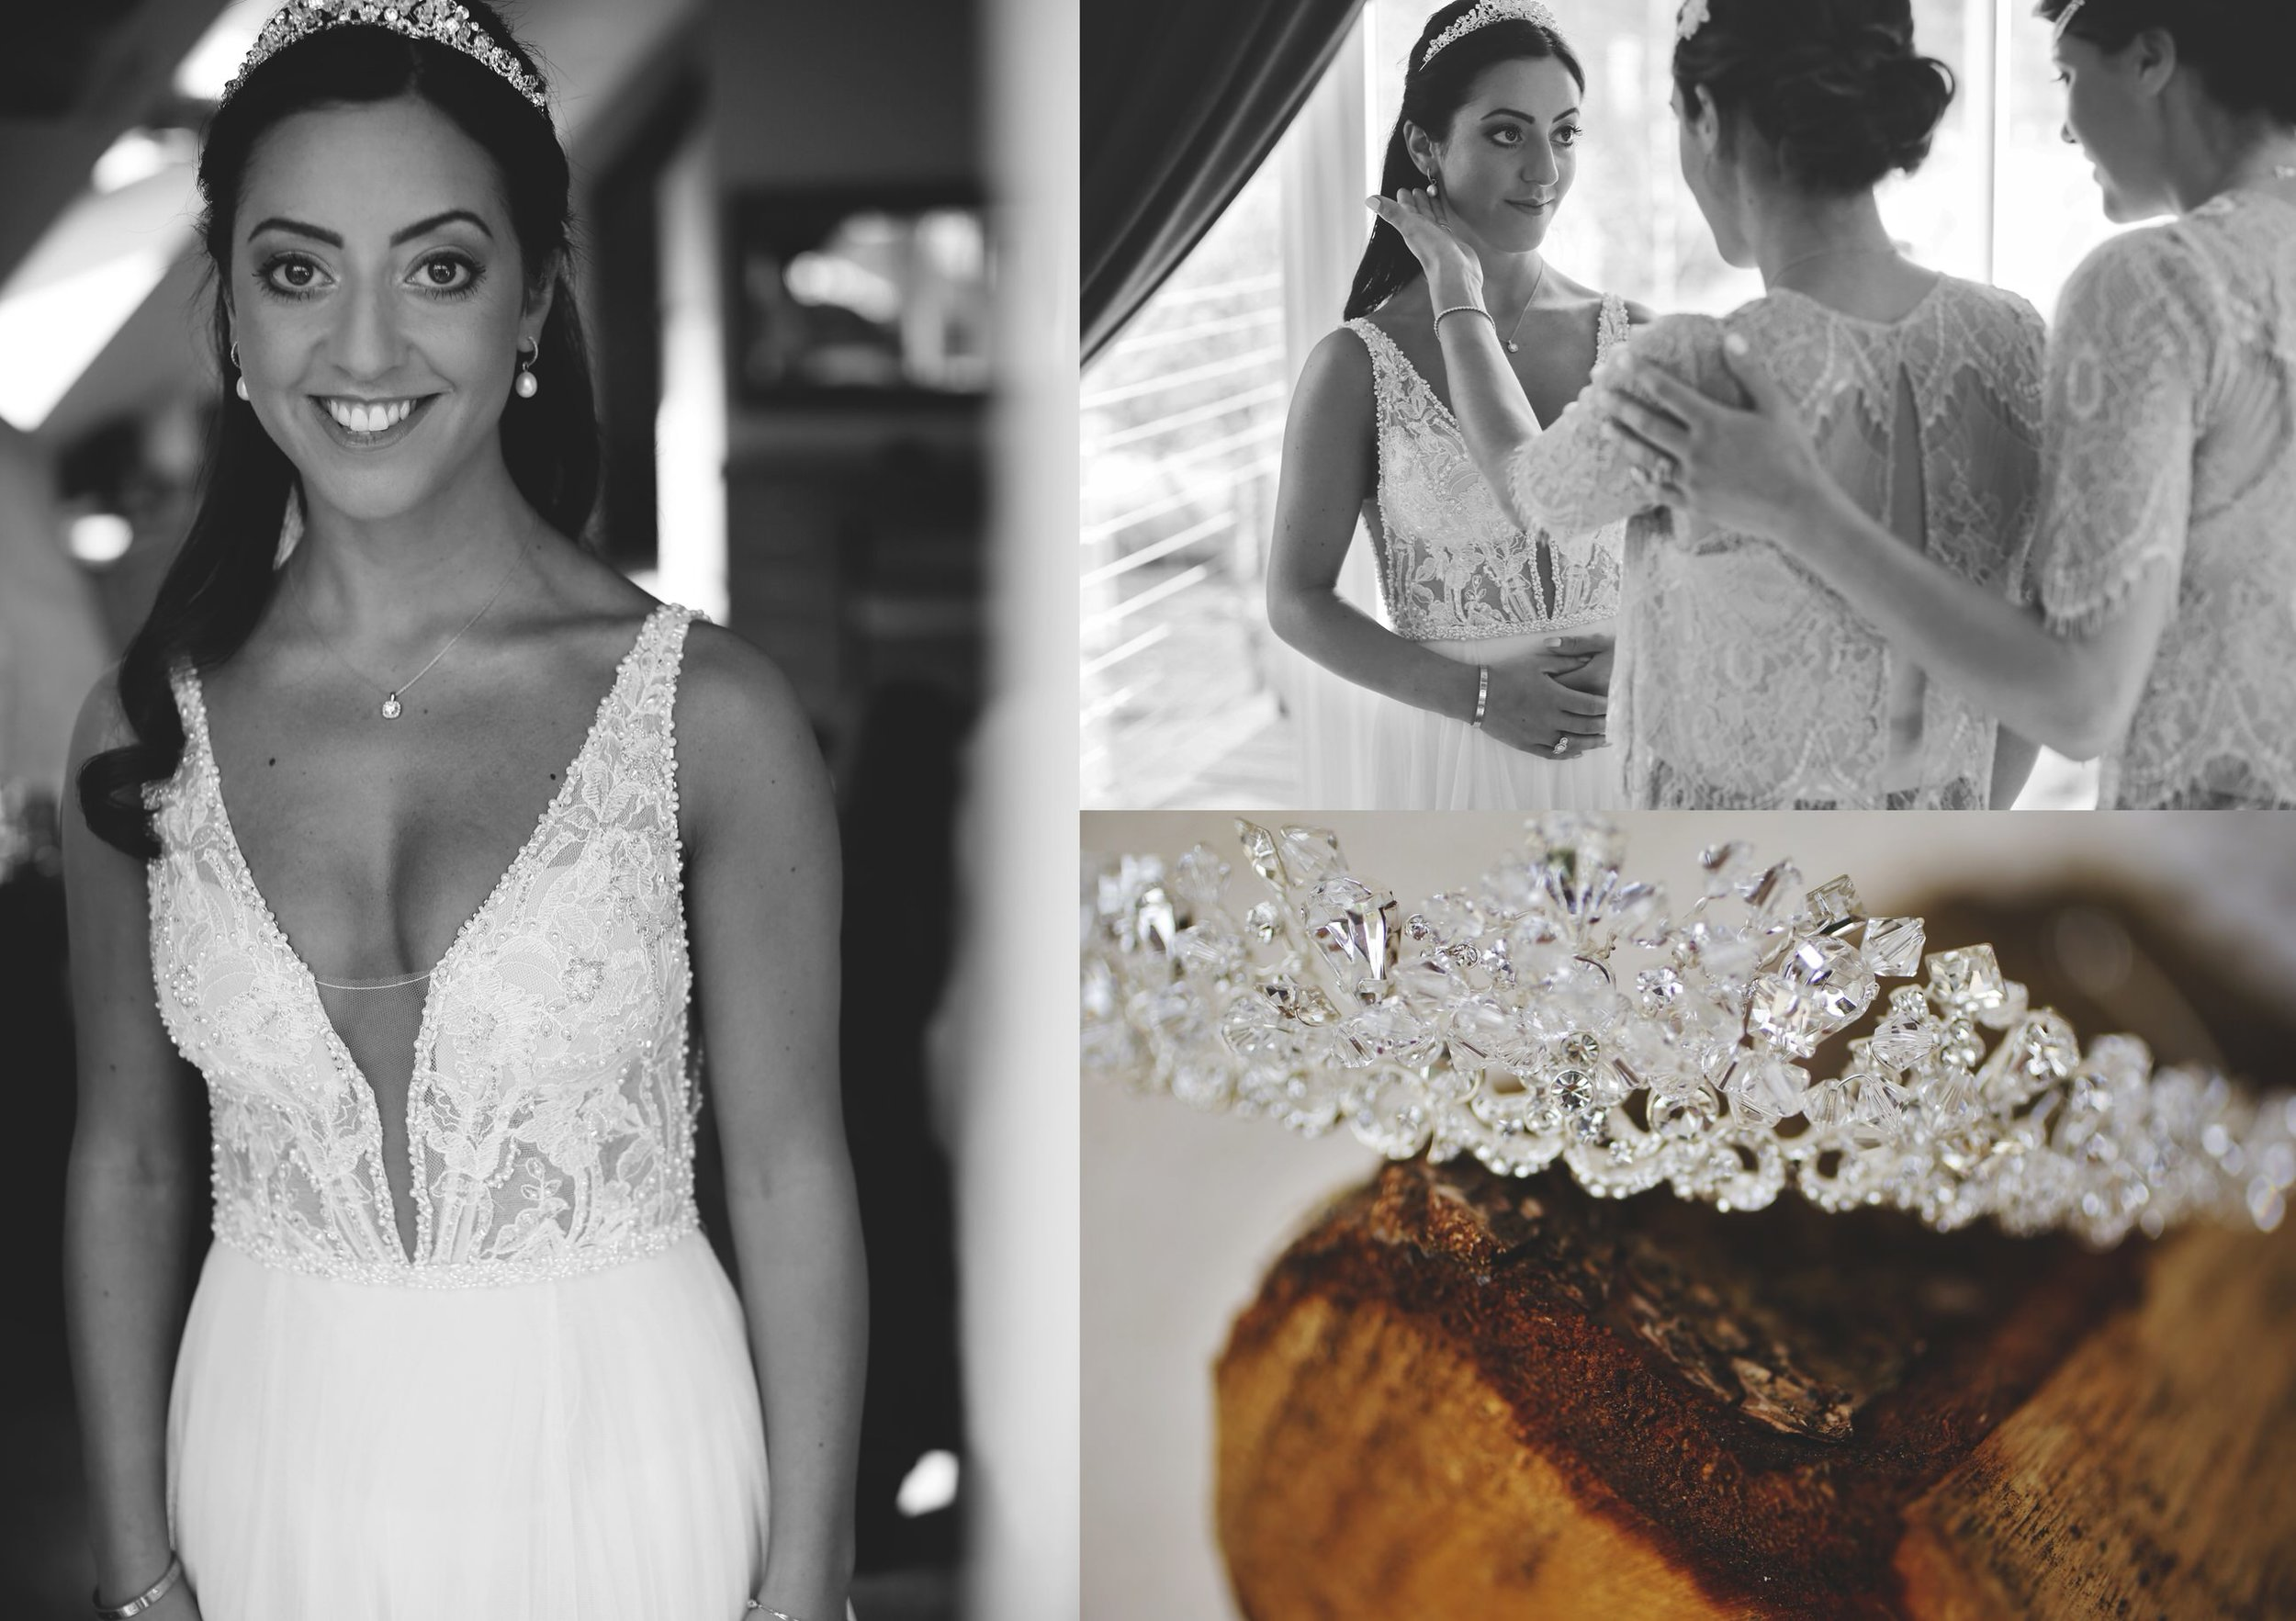 brett-harkness-cotland-wedding-photographer-highland-wedding_0008.jpg